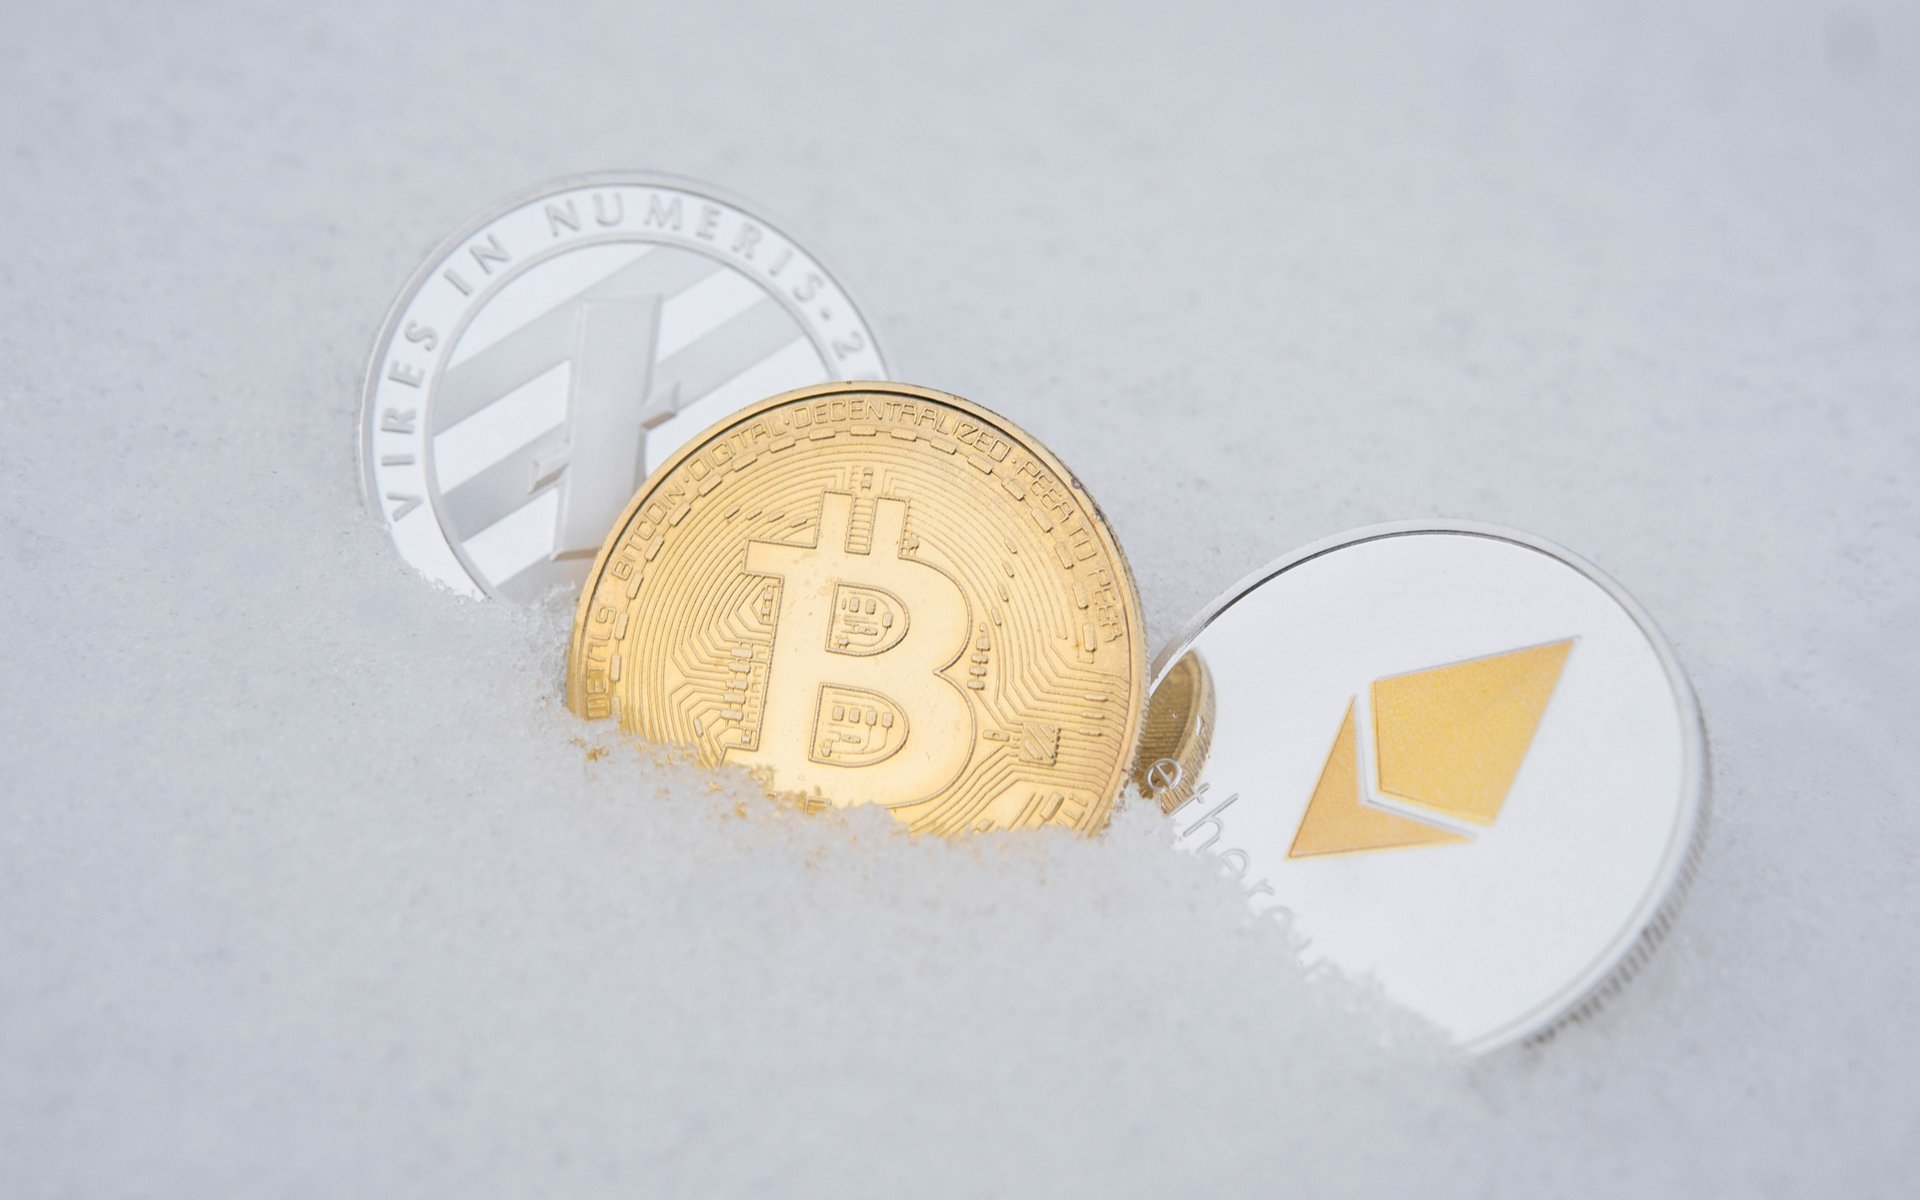 altcoin price ethereum zcash litecoin